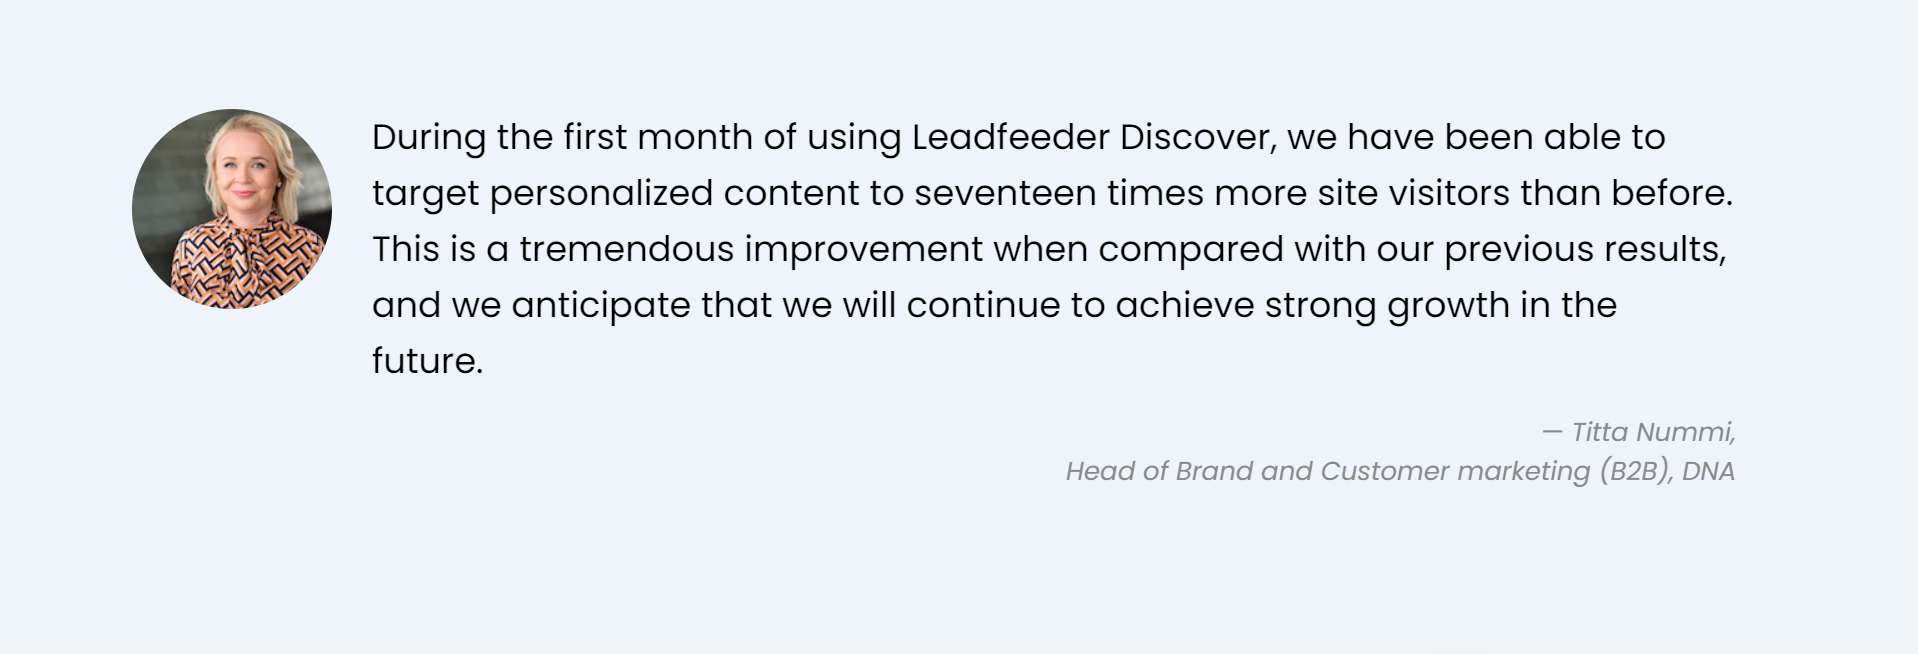 Leadfeeder discover